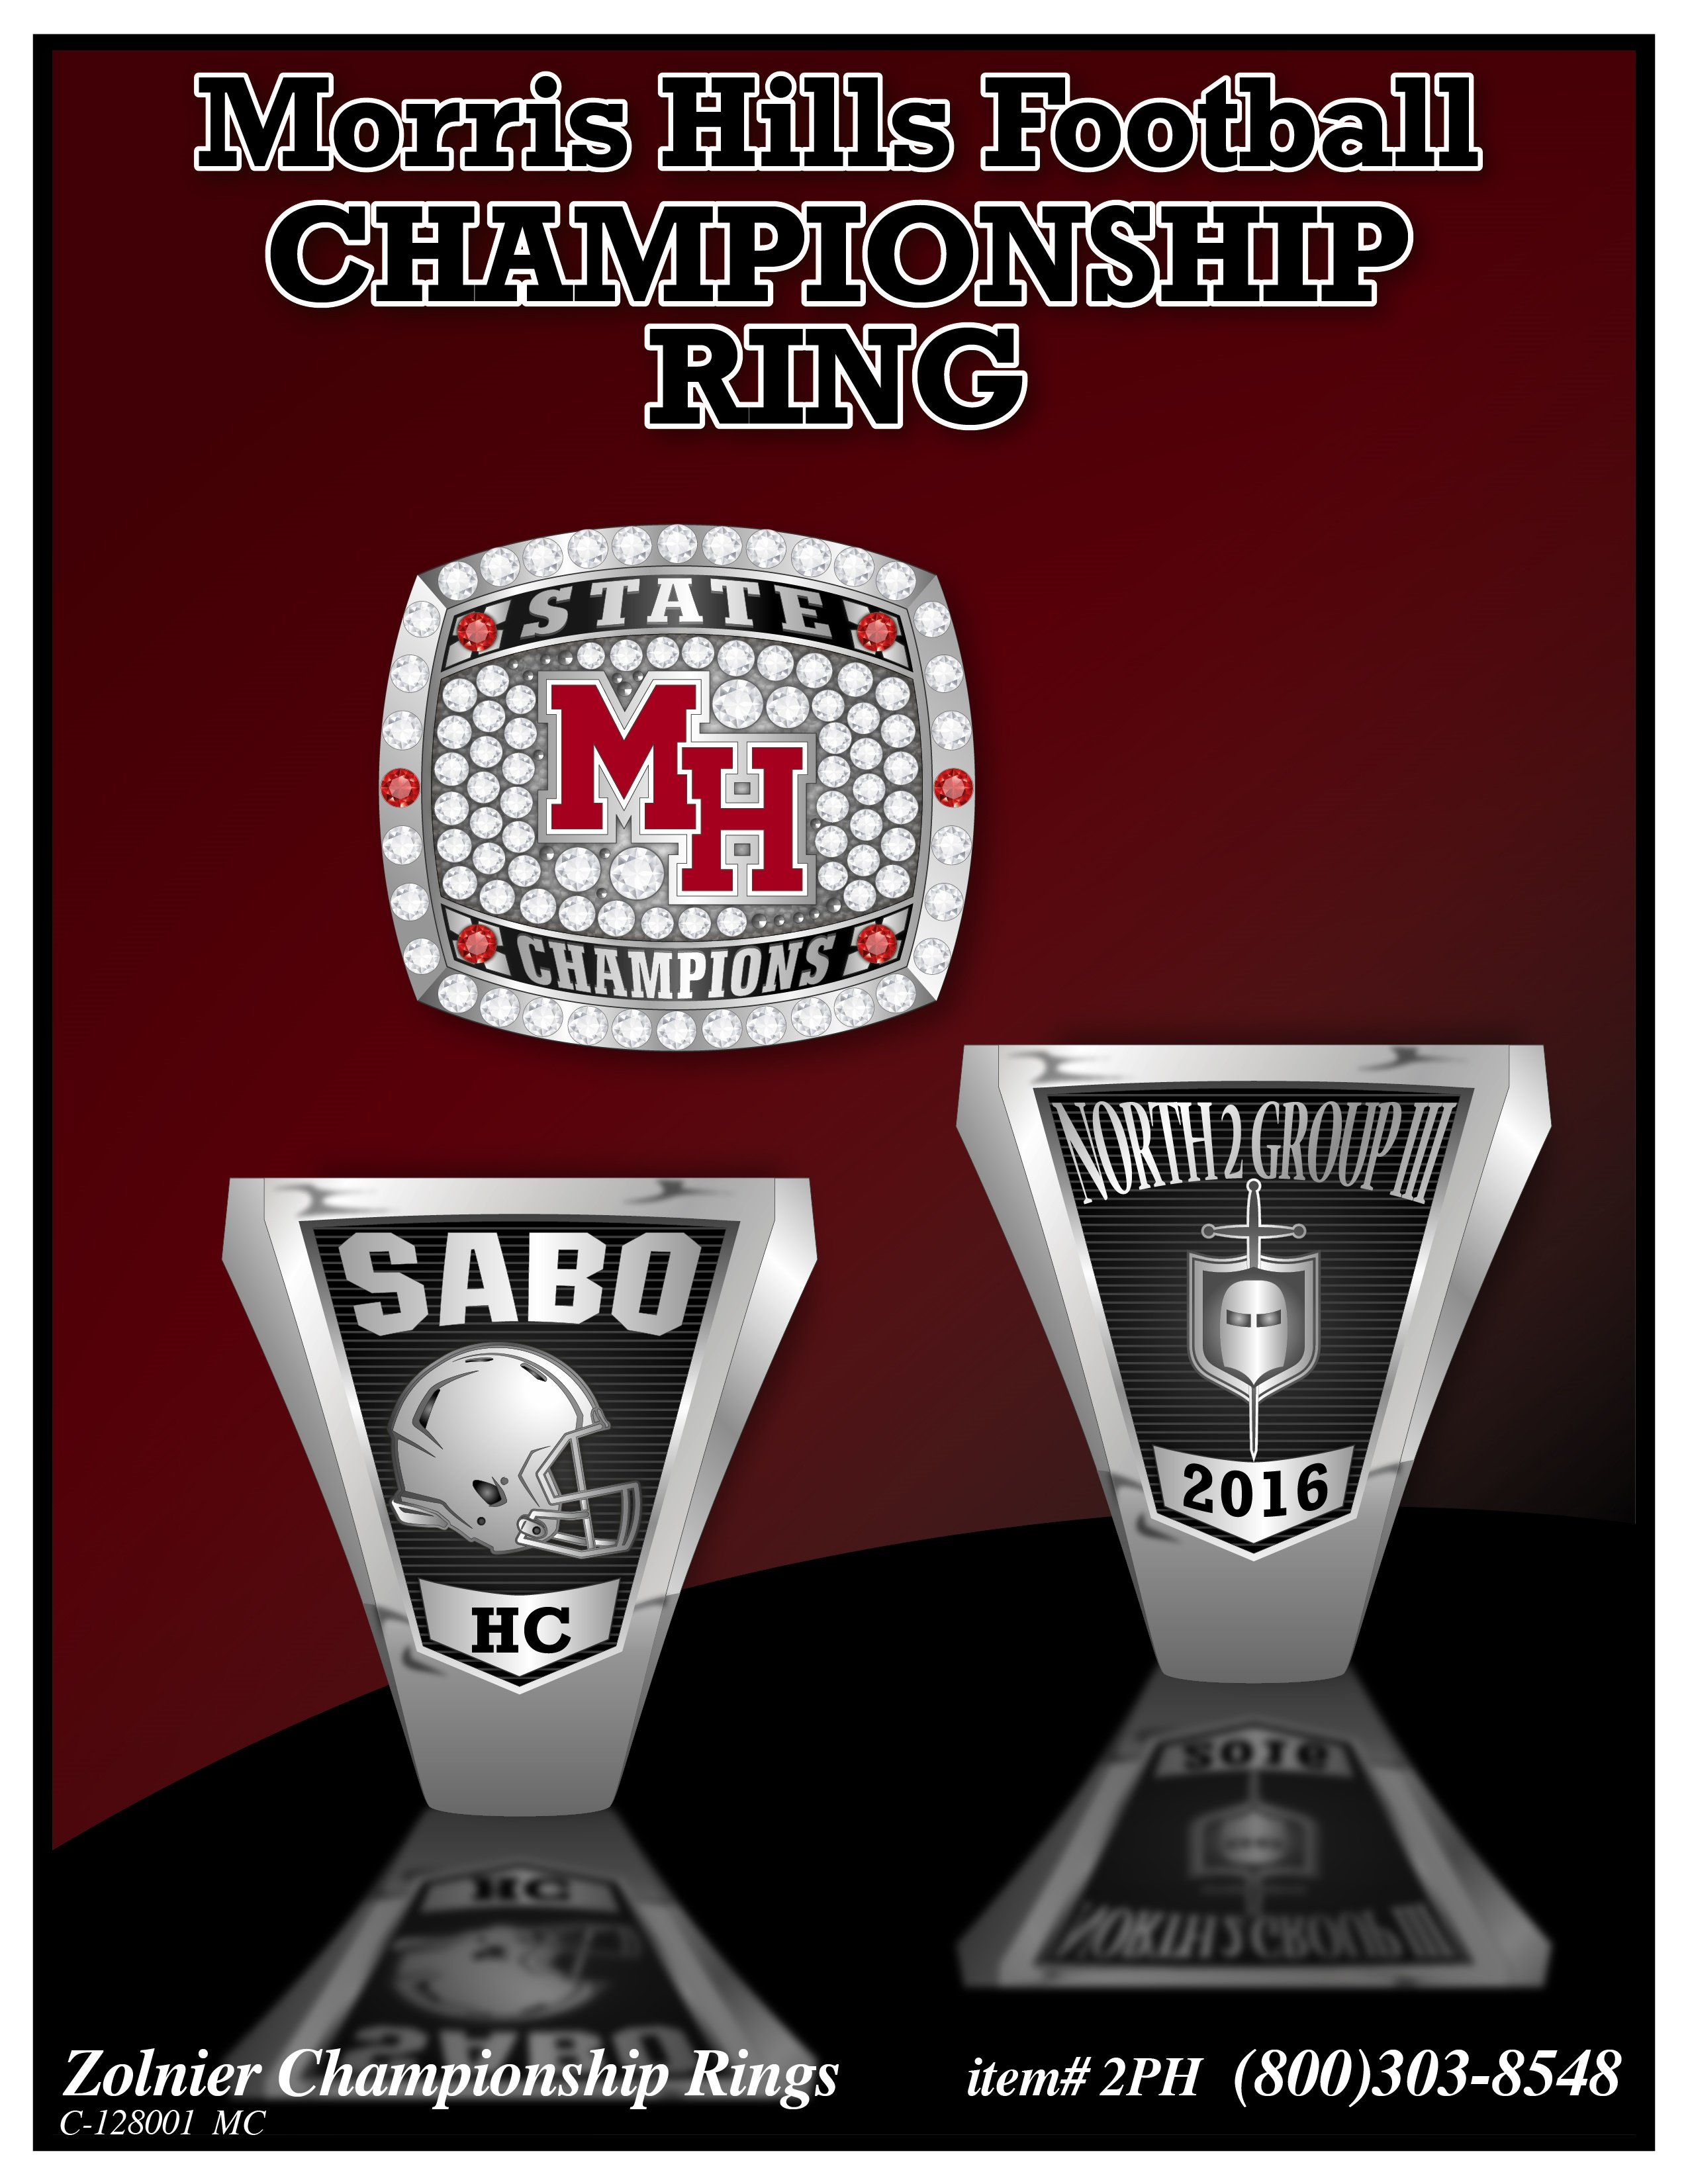 C-128001 ZOLNIER LLT Morris Hills Football Championship Ring MC-01 (1)